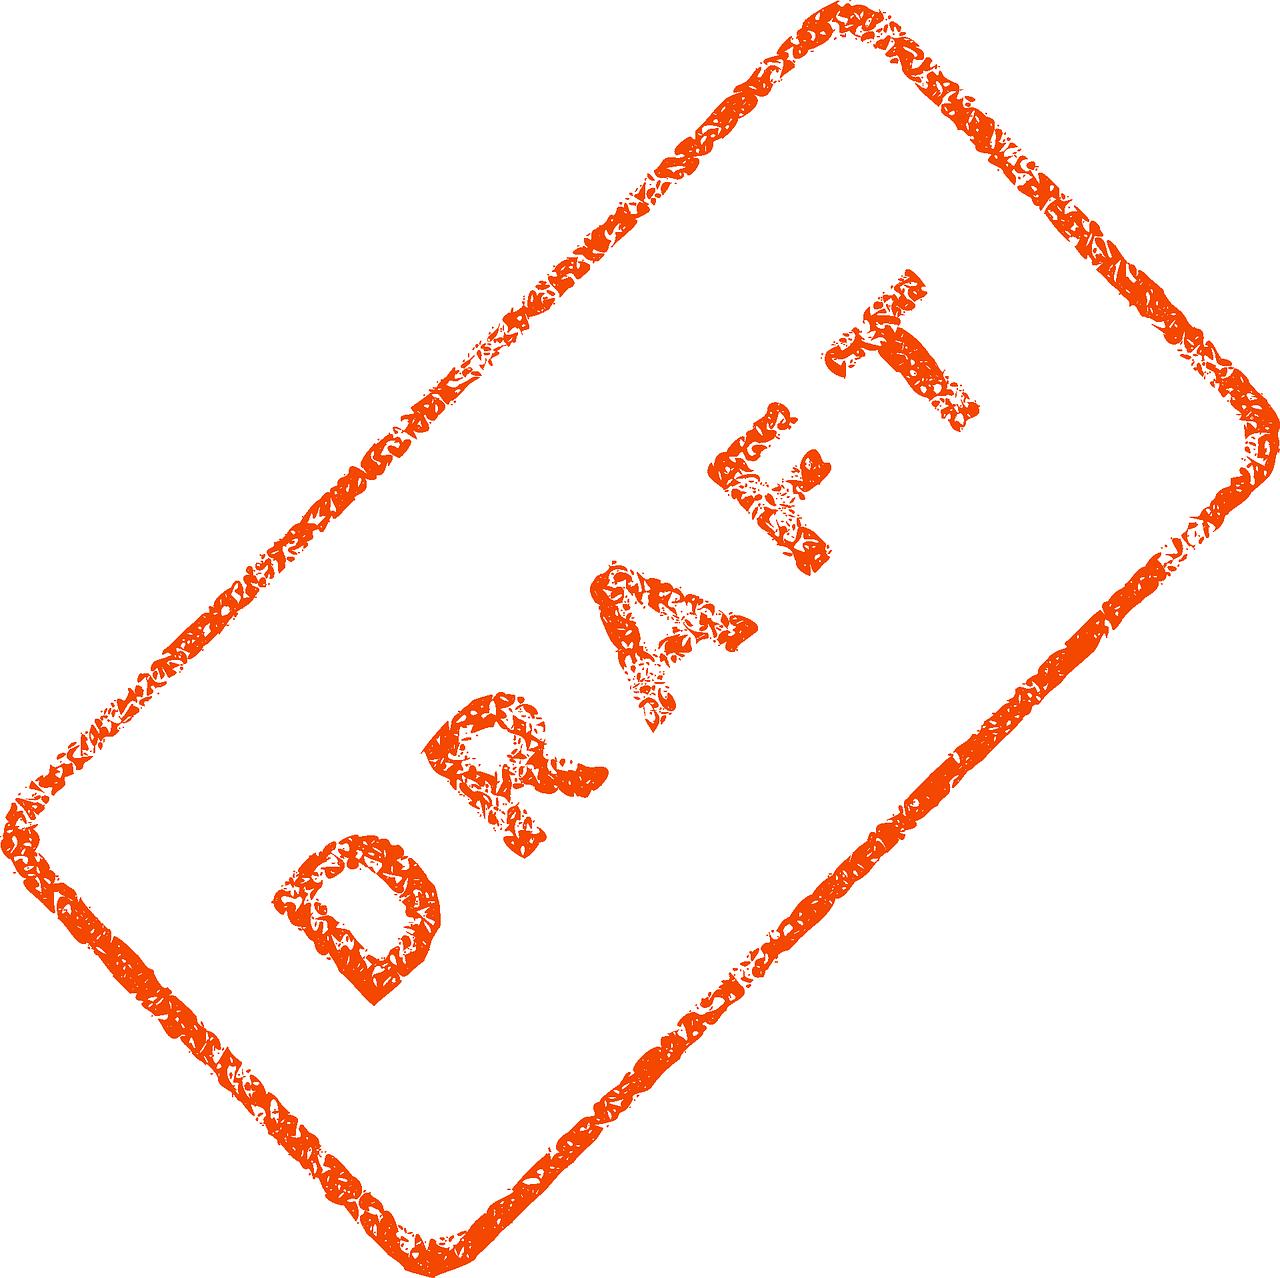 Essay clipart rough draft, Essay rough draft Transparent.